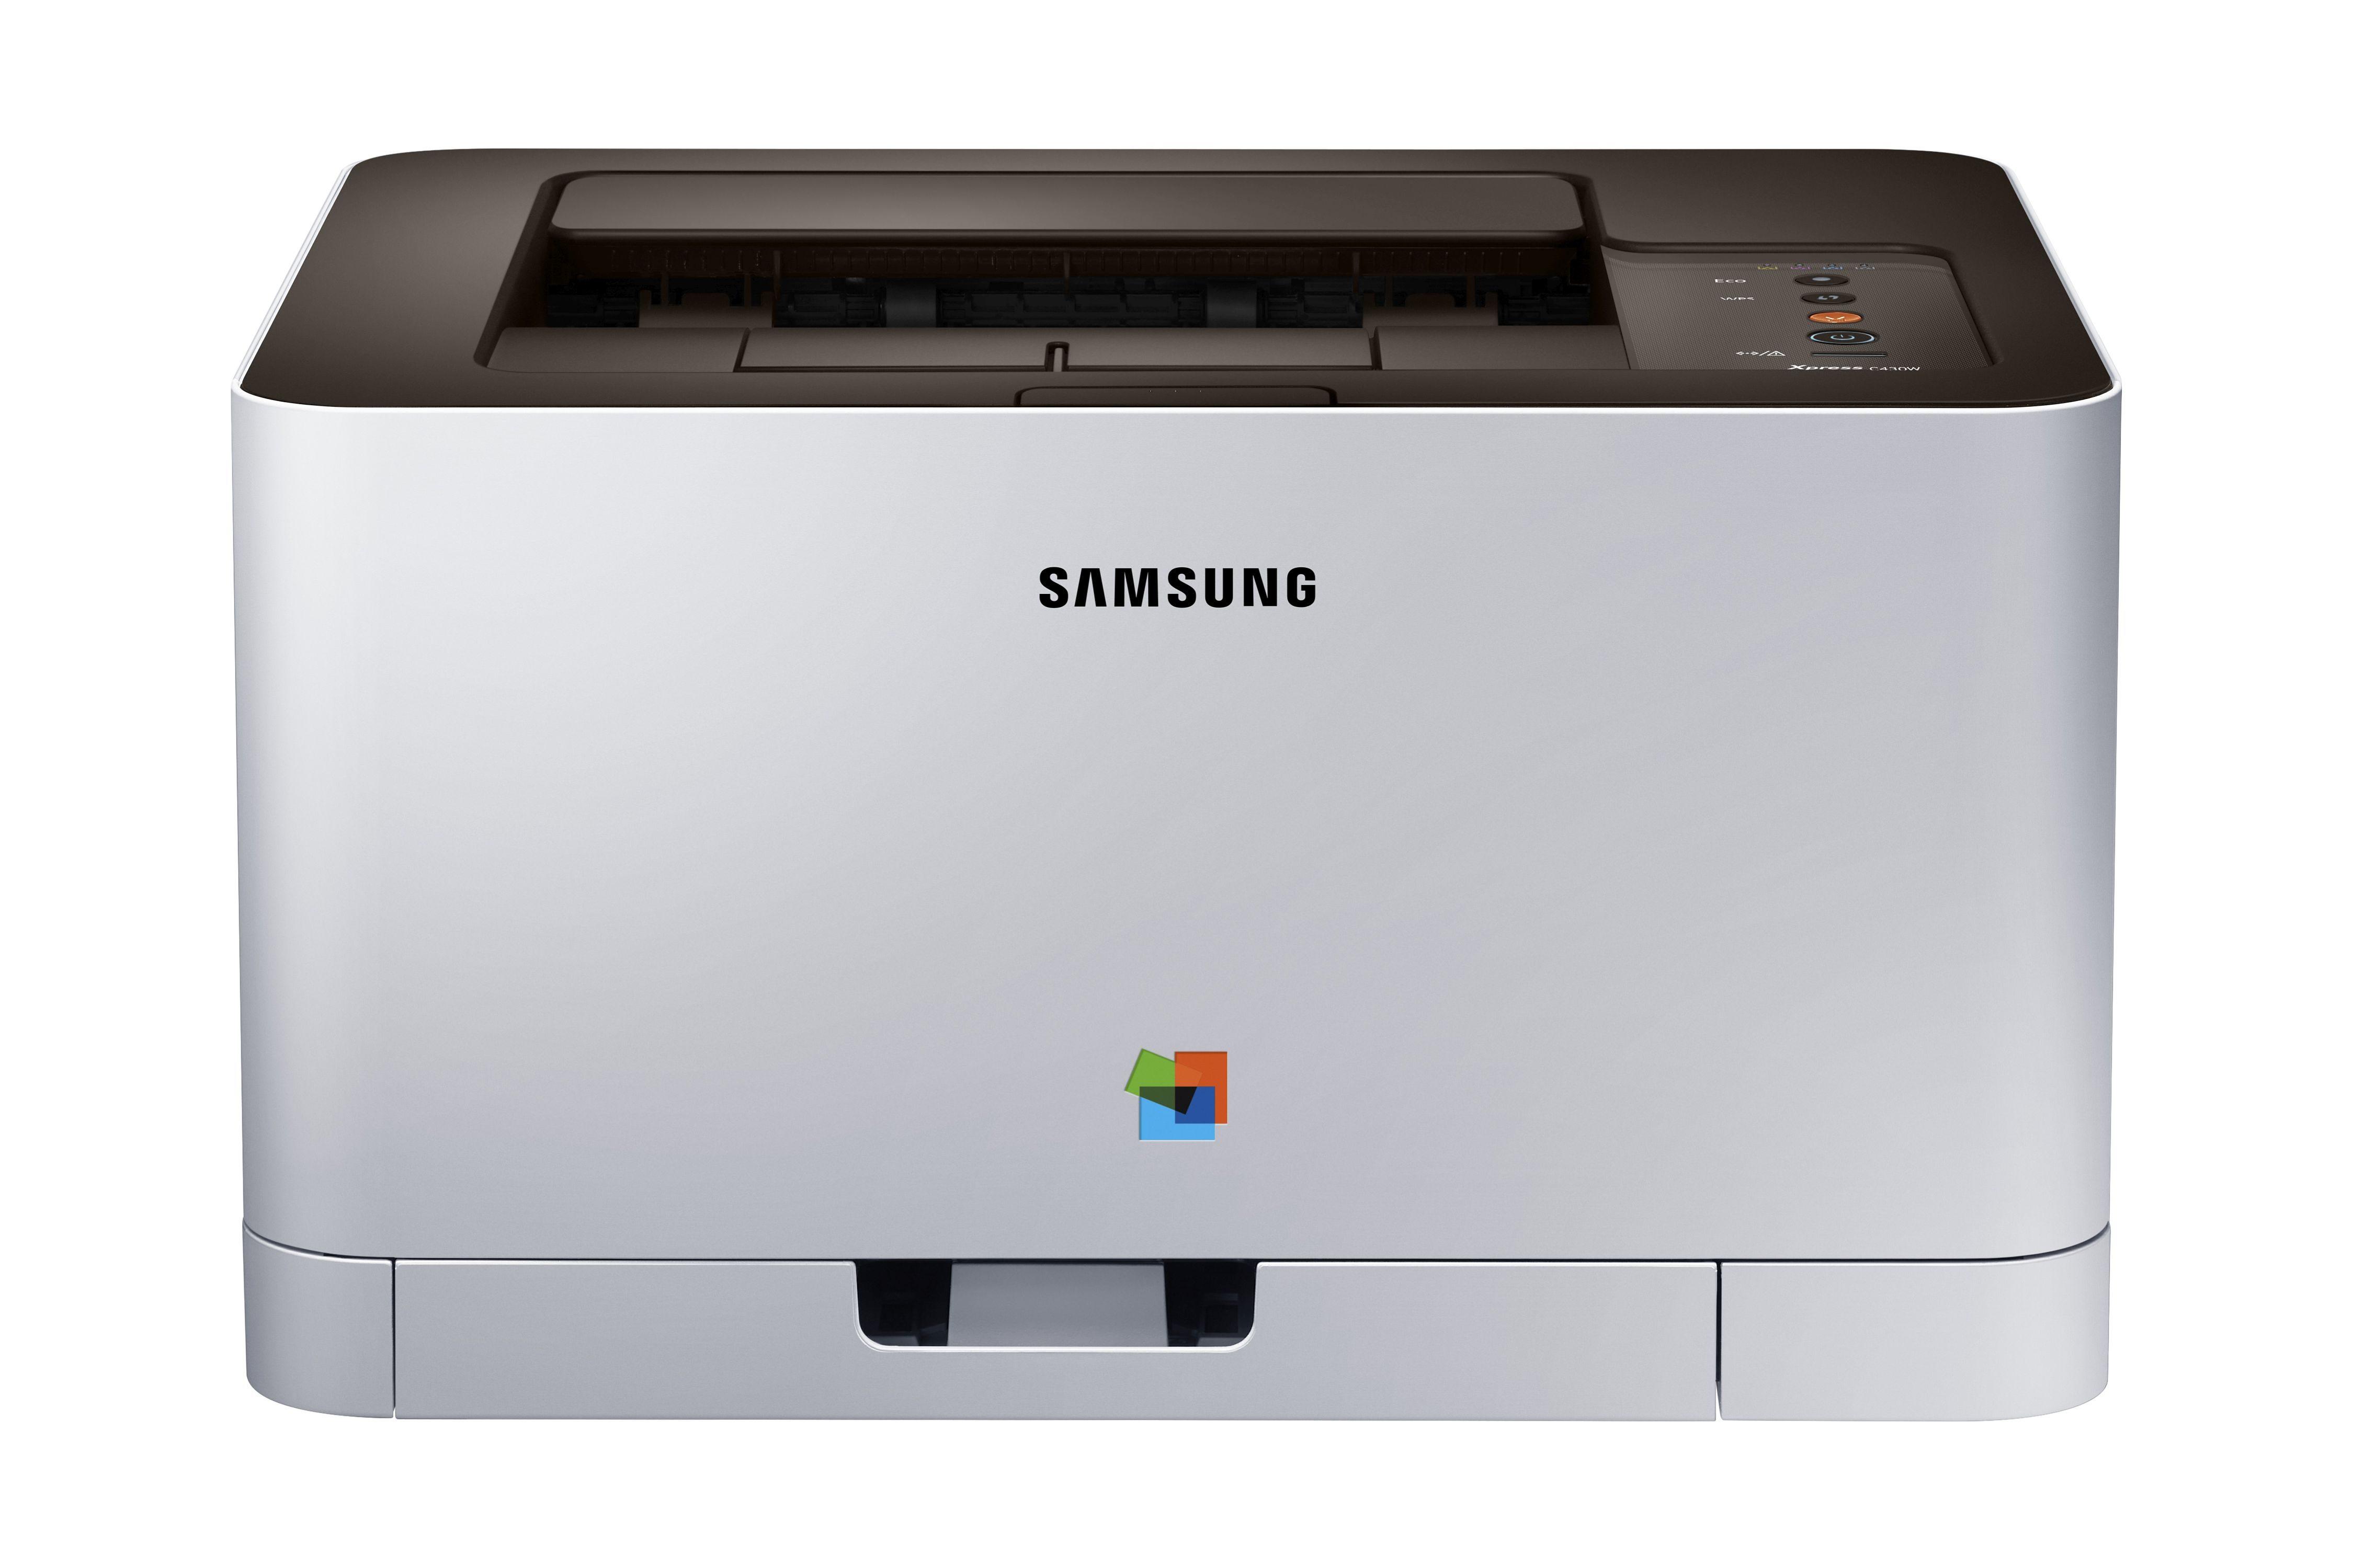 Samsung Farblaser-Drucker »Xpress C430 Color Laser (SL-C430/TEG)«